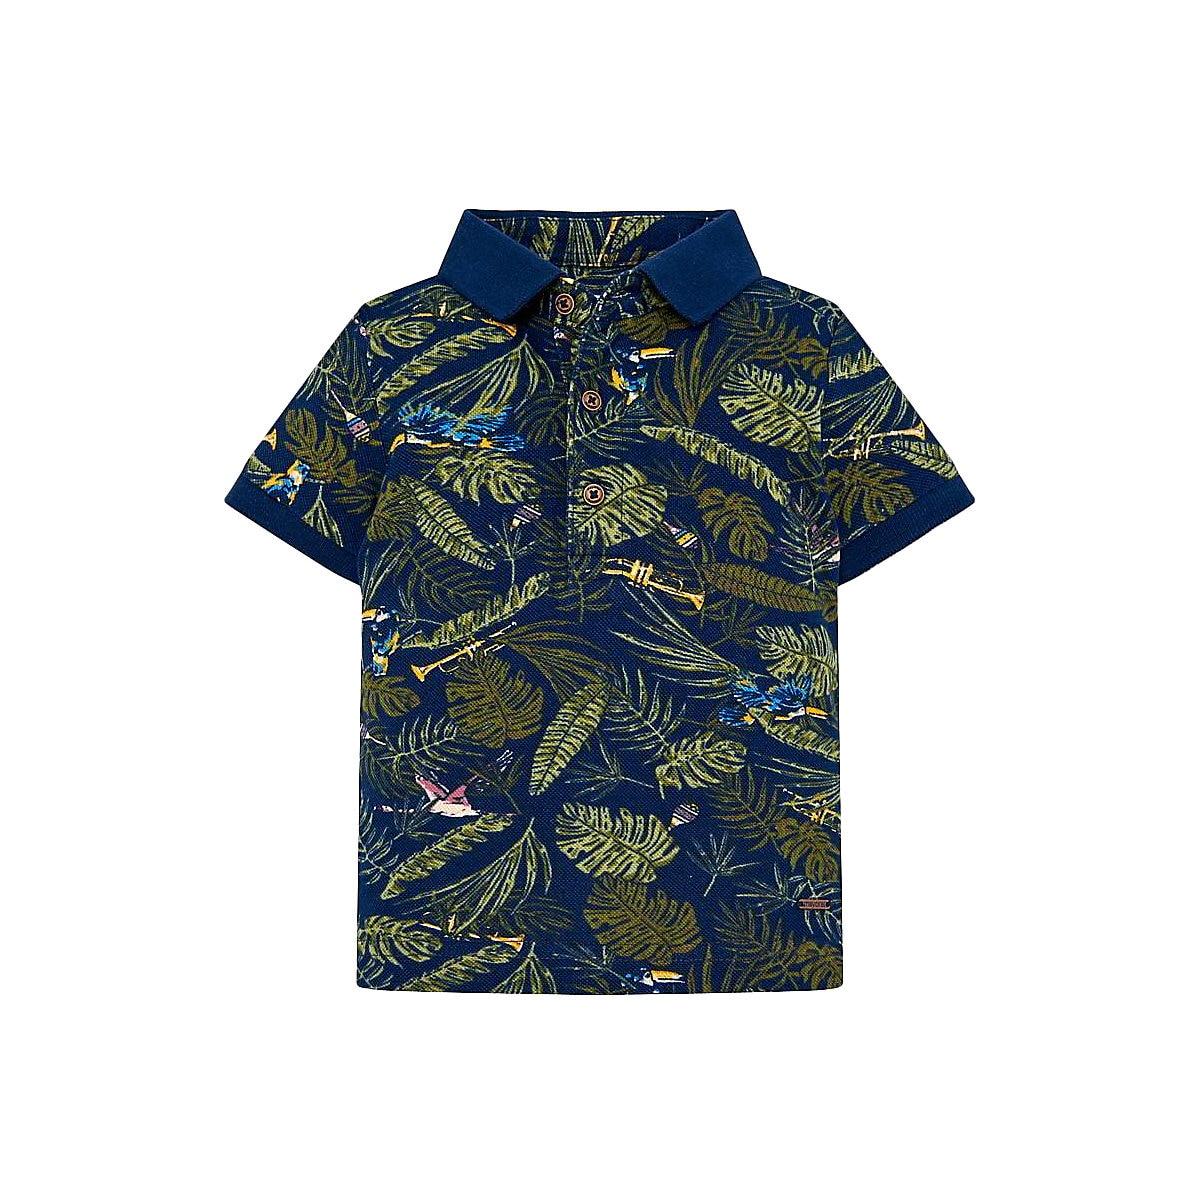 MAYORAL Polo Shirts 10685220 children clothing t-shirt shirt the print for boys tiger 3d print basic t shirt